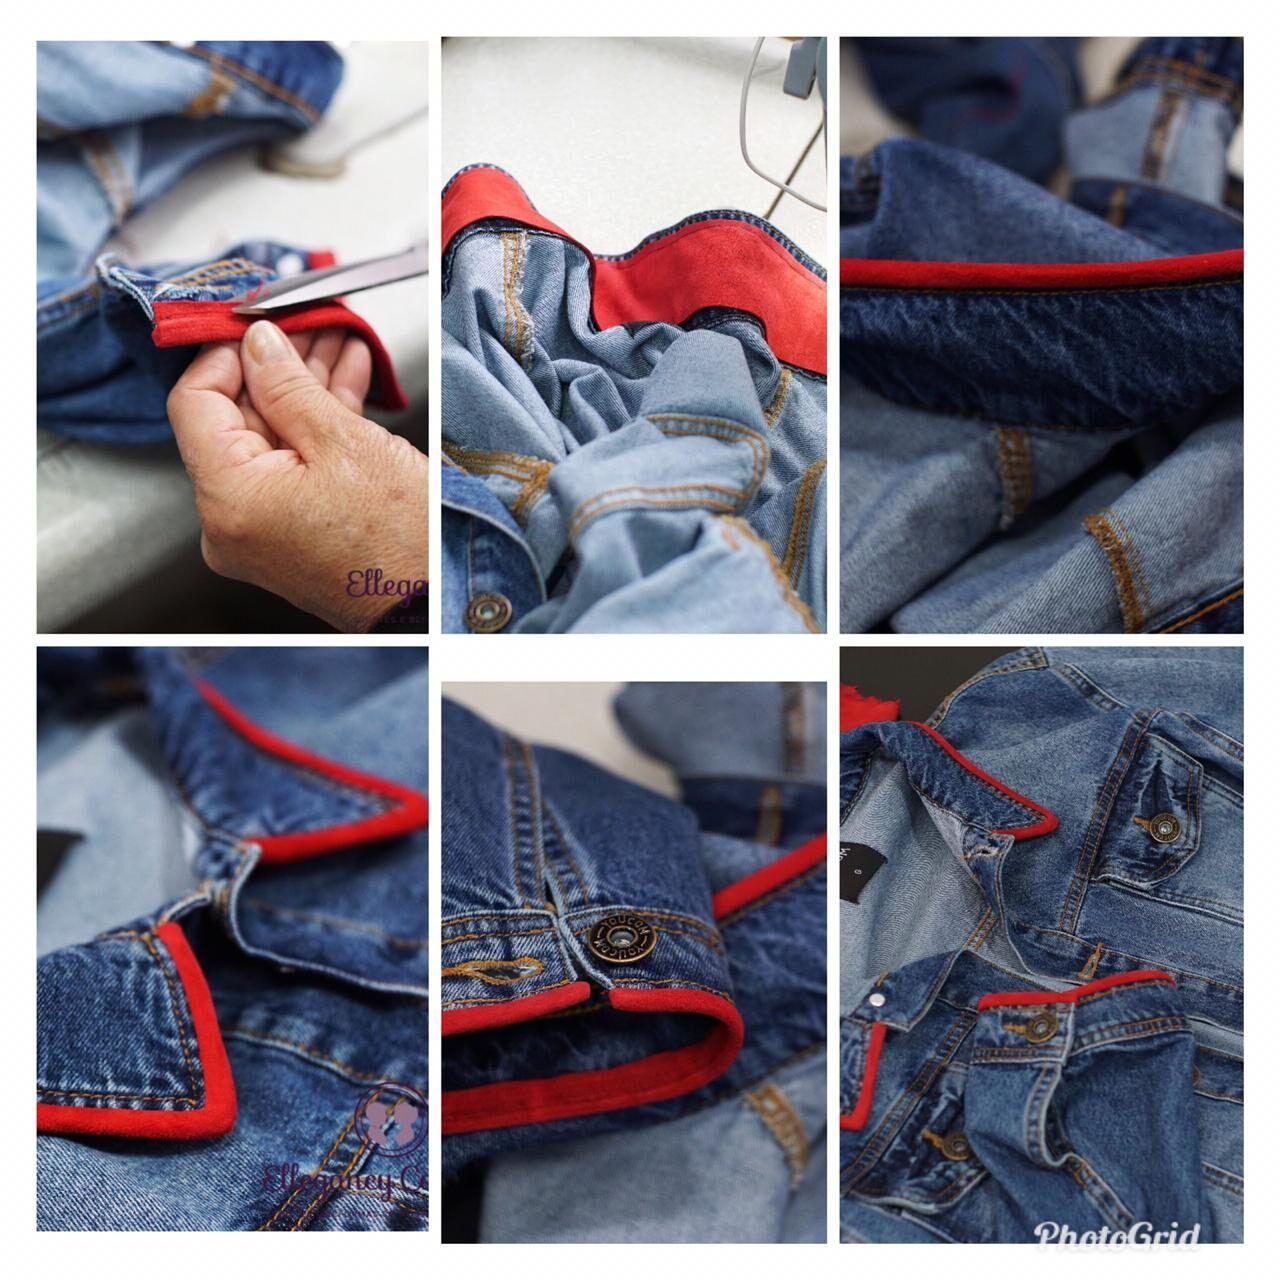 jaqueta-jeans-com-couro-customizar-jaqueta-jeans-6745559